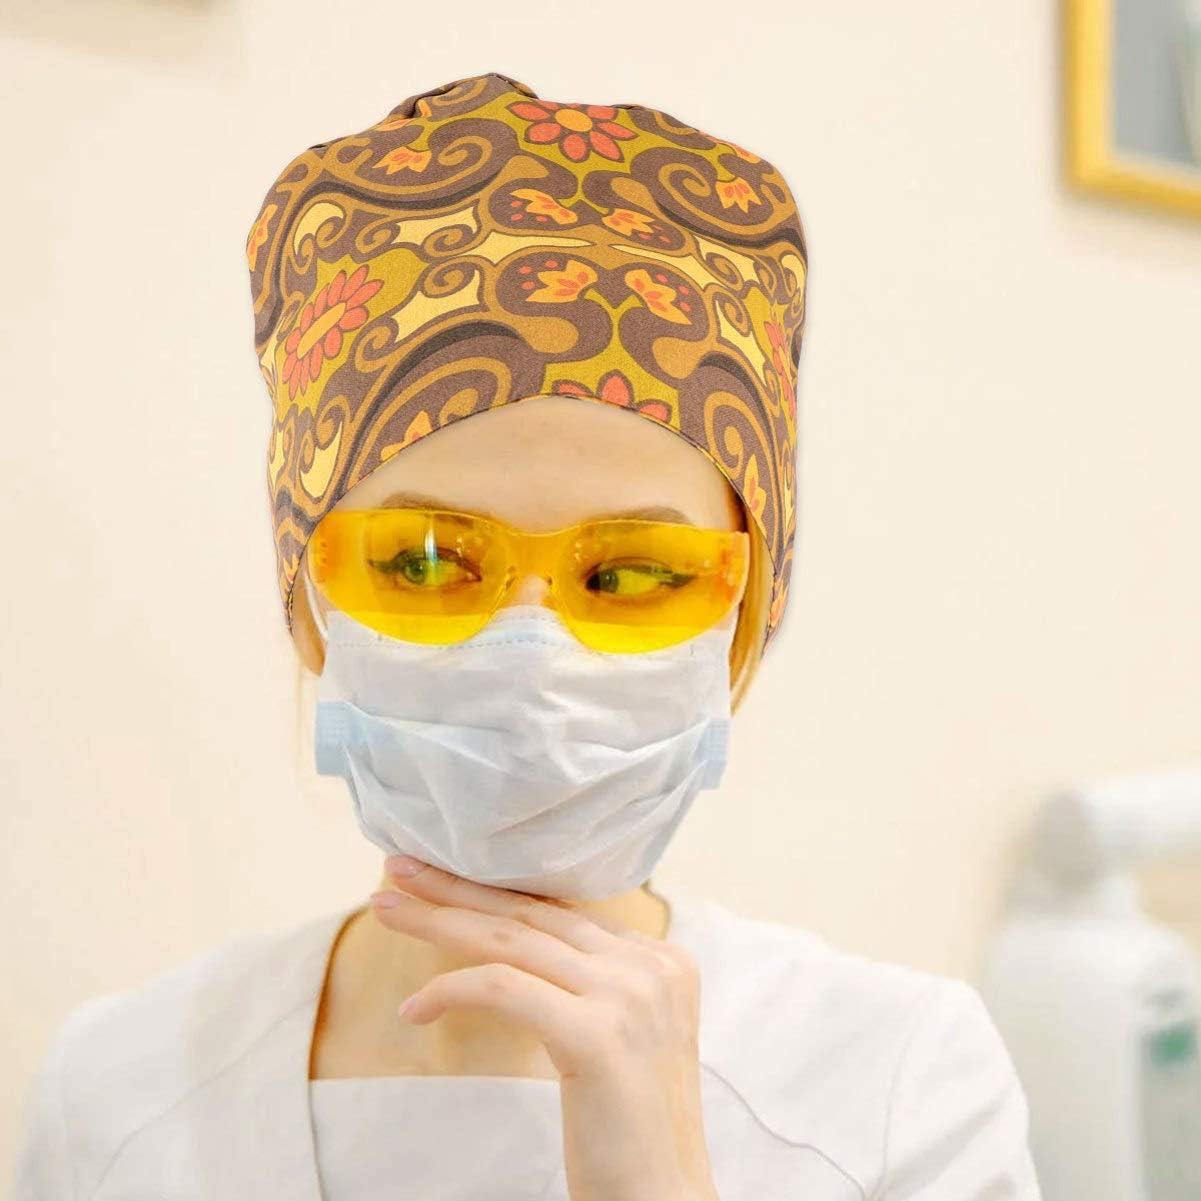 PRETYZOOM Printed Doctor Surgical Scrub Hat Nurse Scrub Cap Bouffant Turban Cap for Women Men